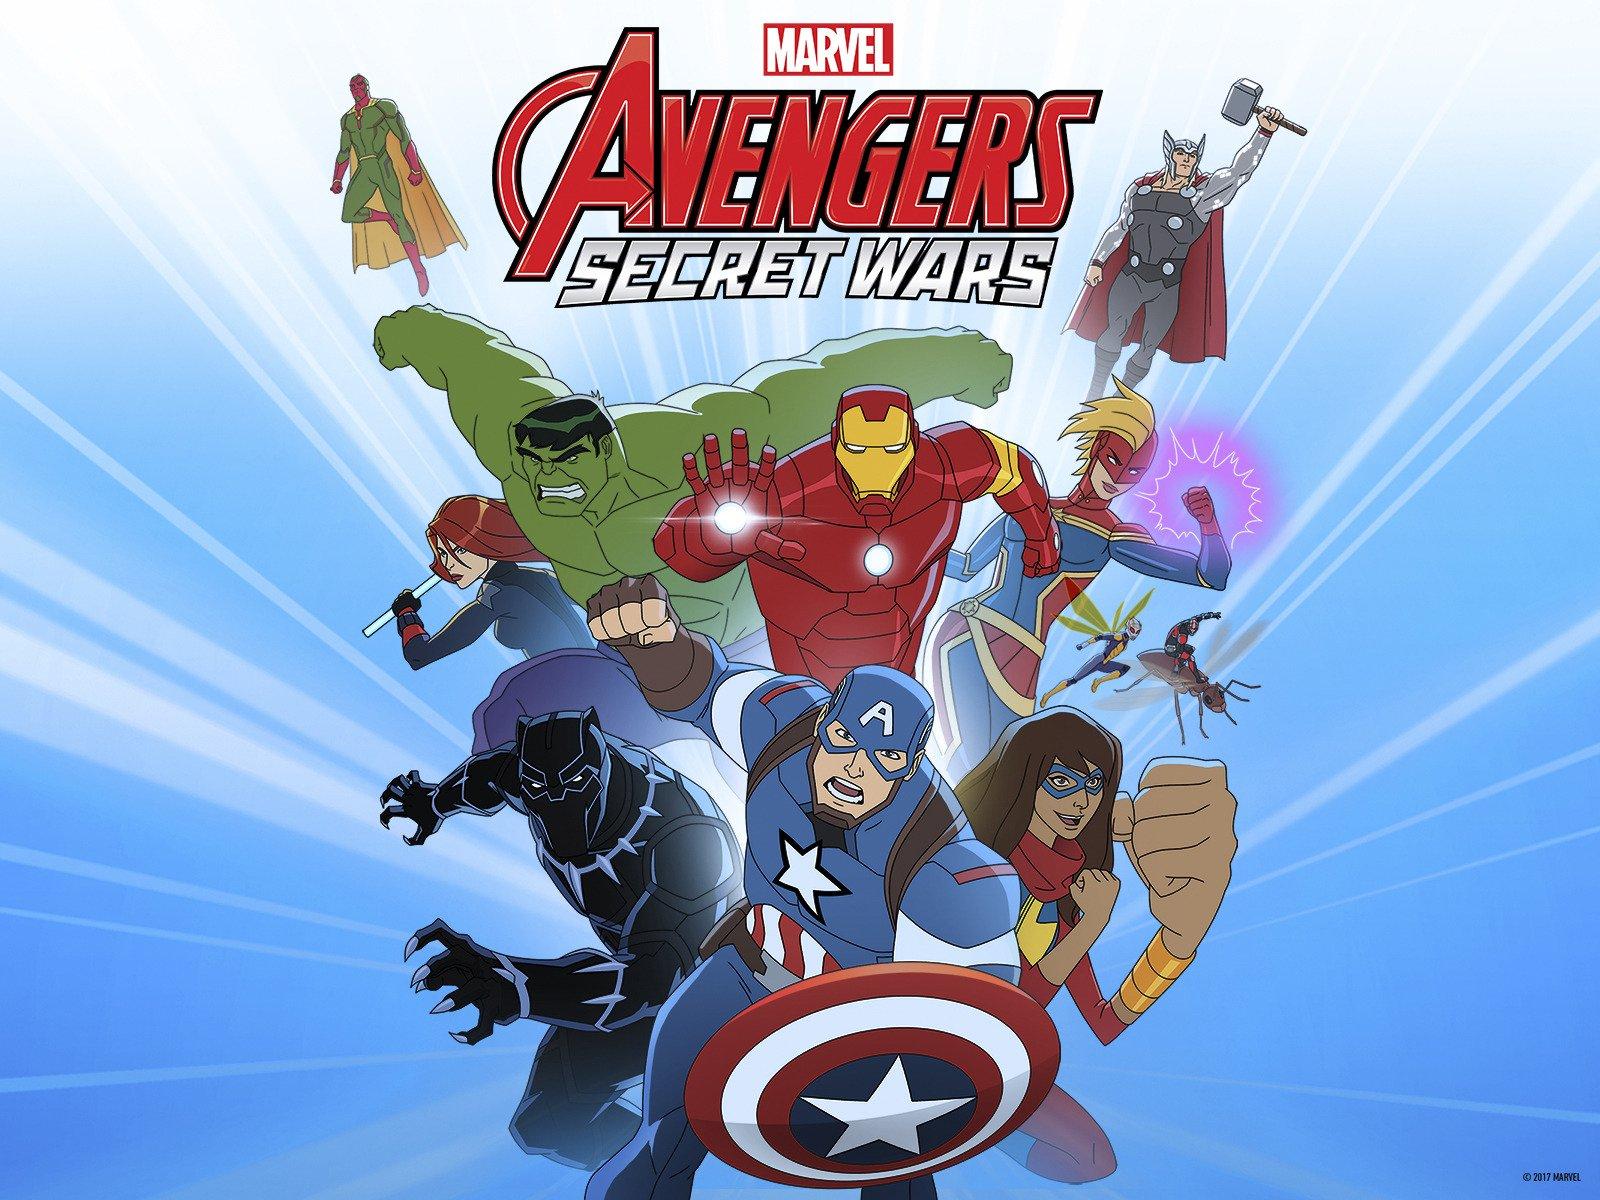 Marvels Avengersemble